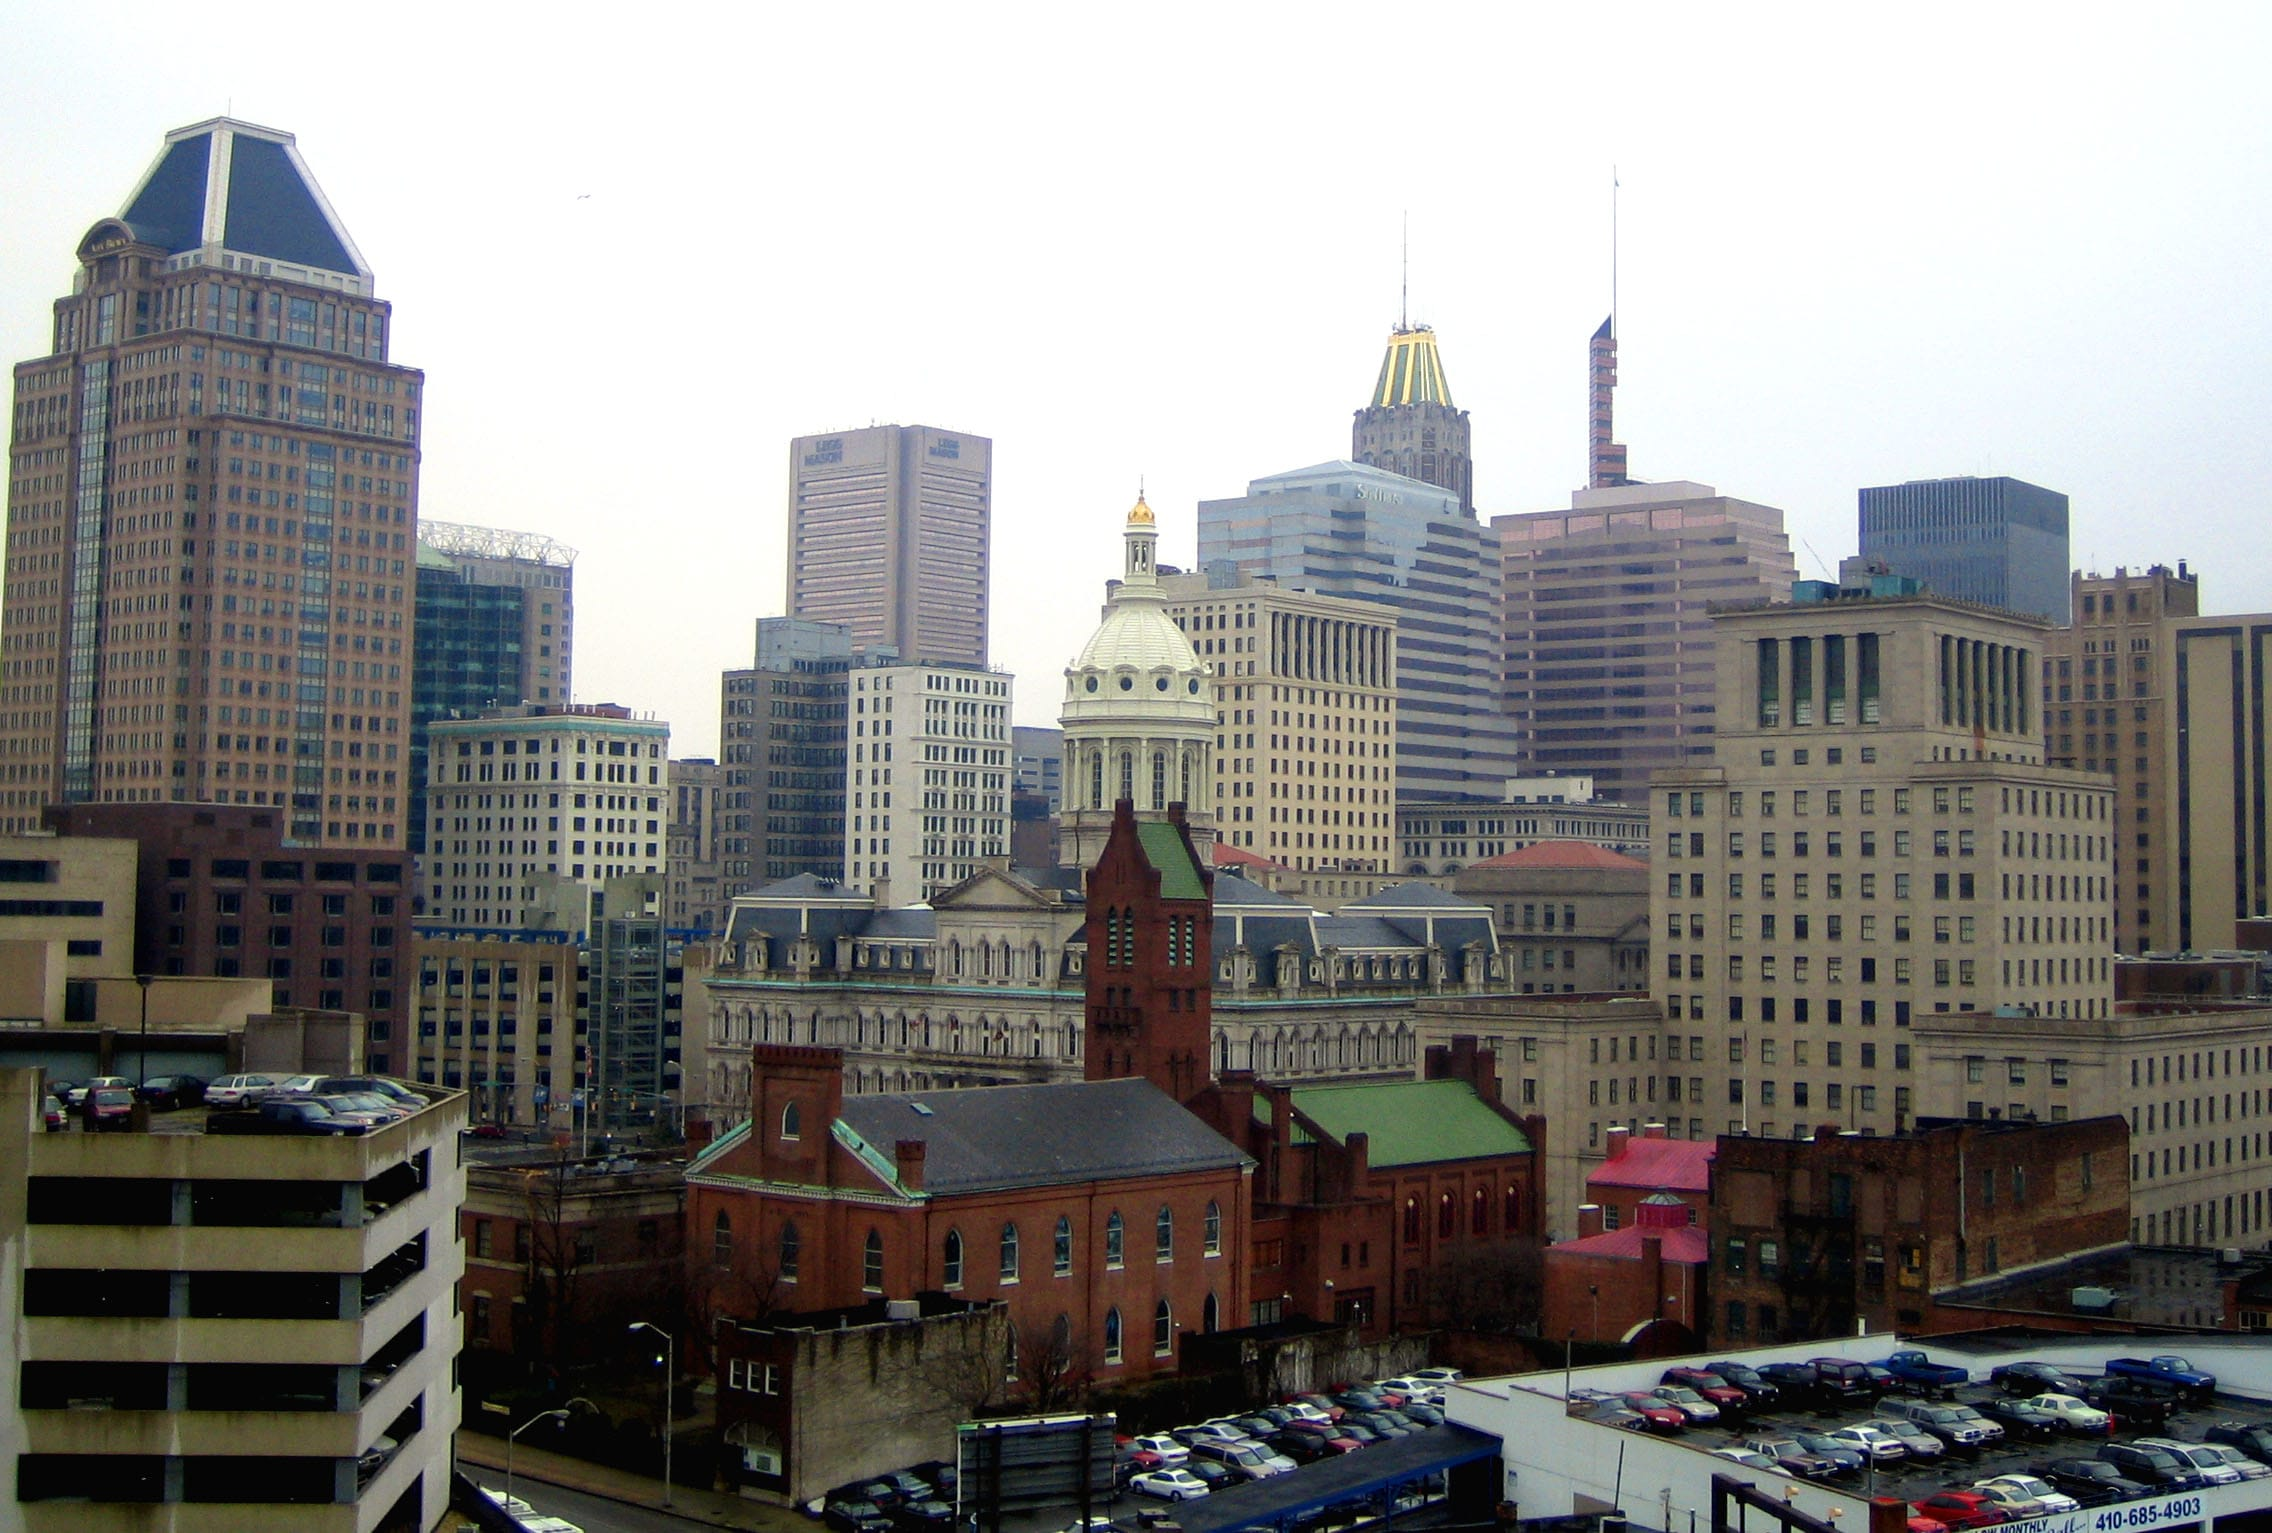 Baltimore widescreen wallpapers